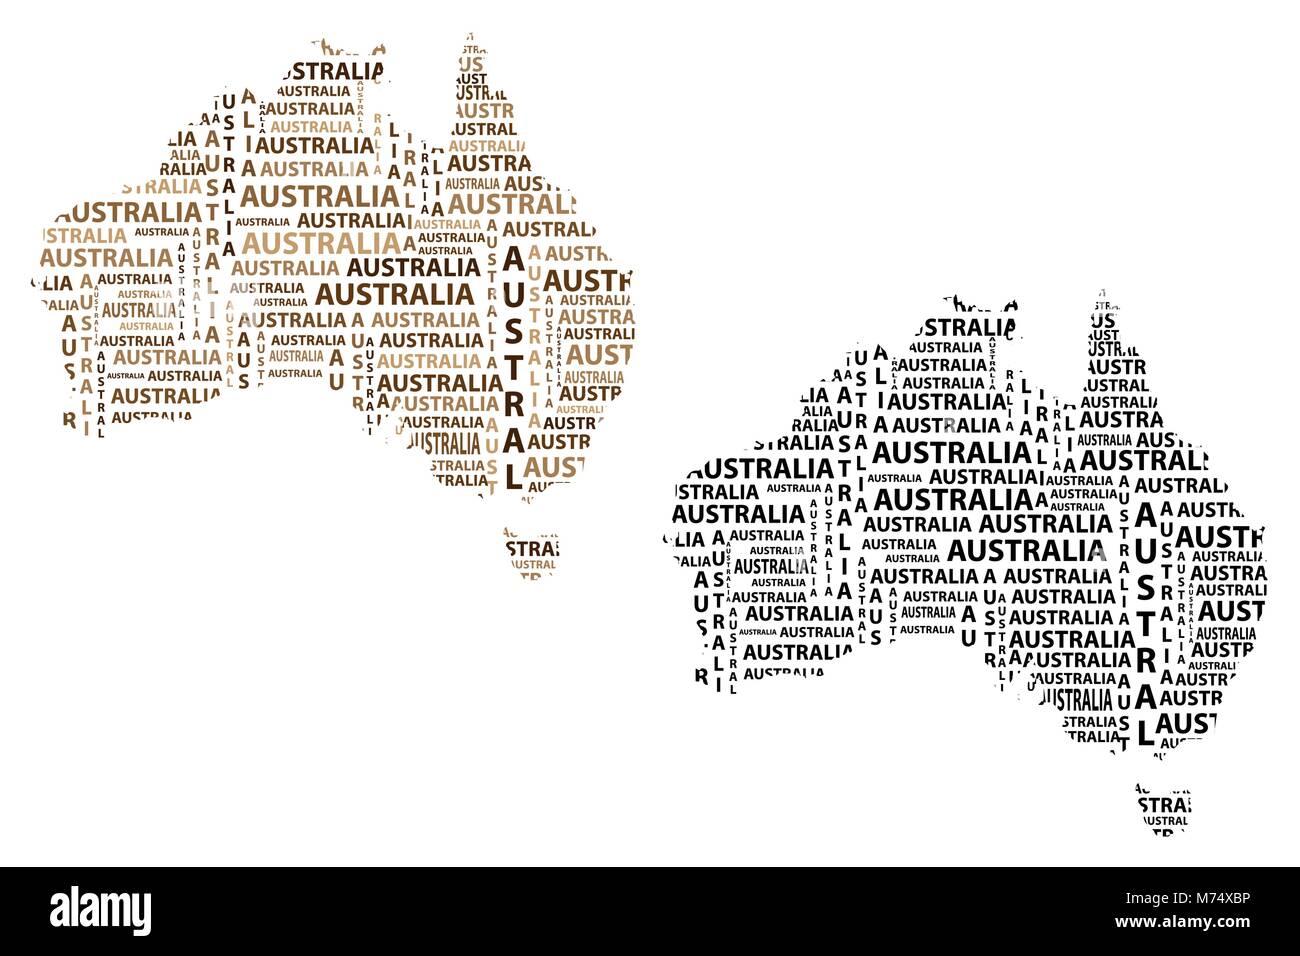 Australia Map Shape.Sketch Australia Letter Text Continent Australia Word In The